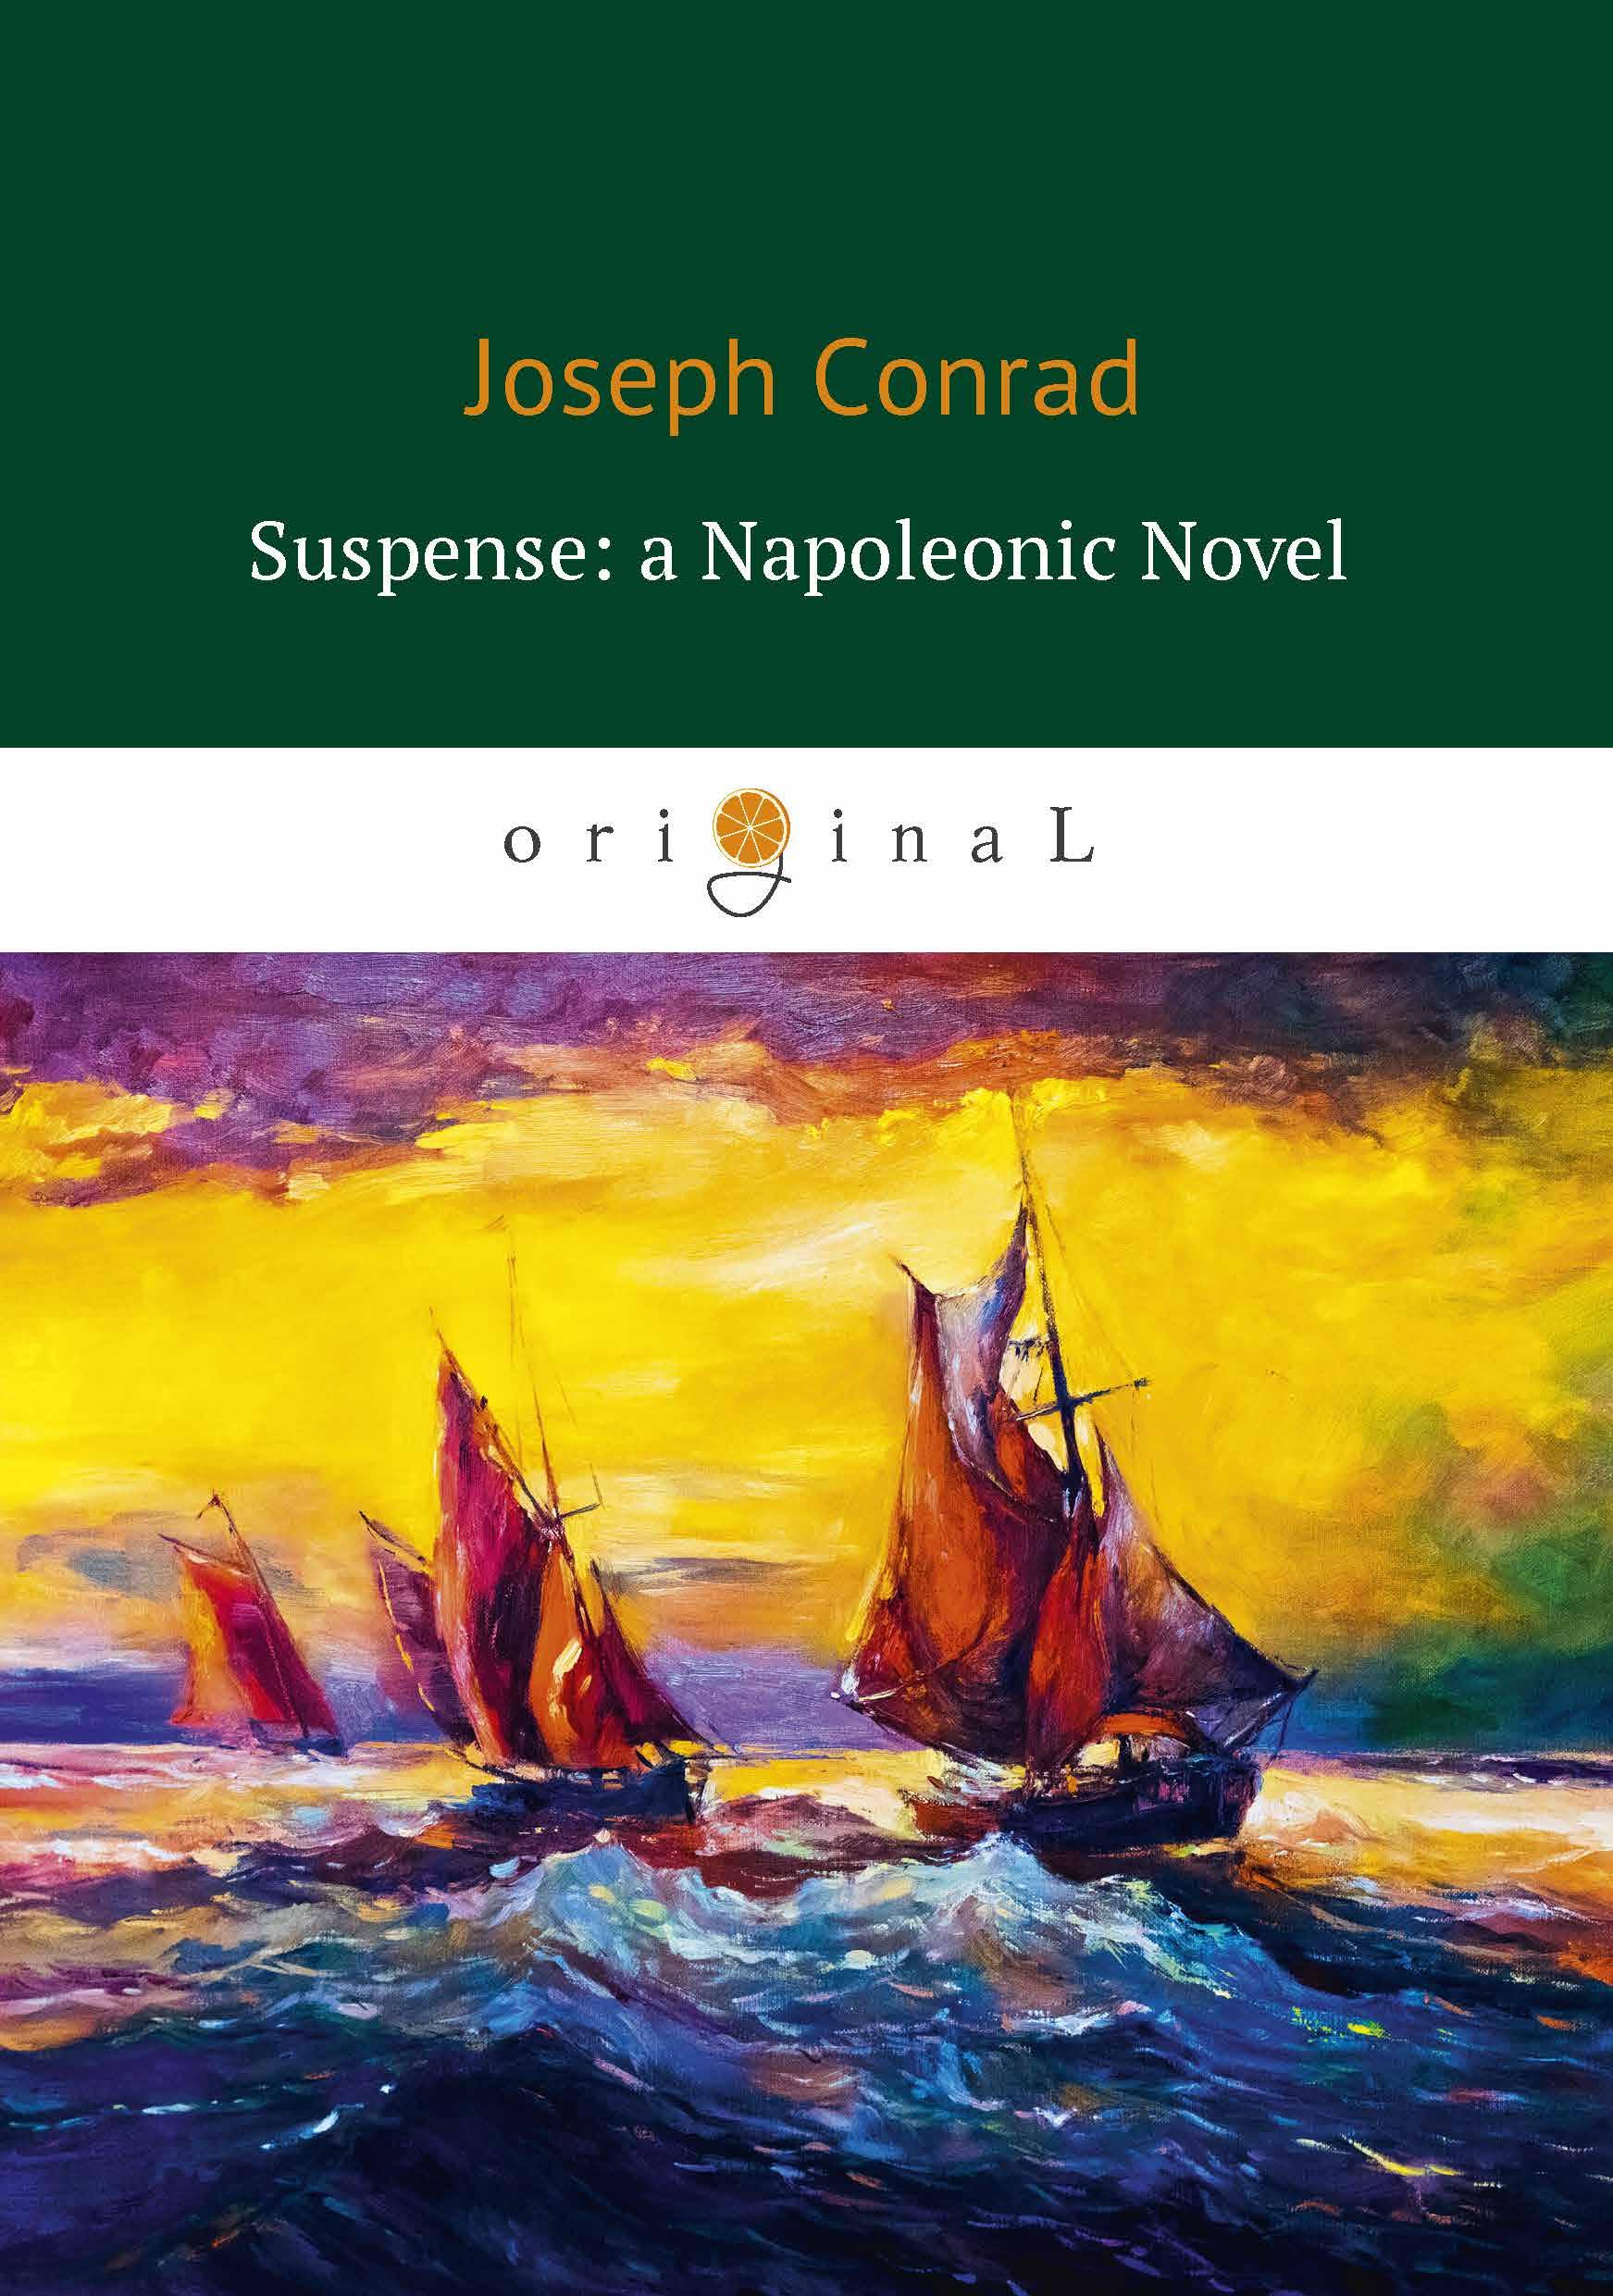 Joseph Conrad Suspense: a Napoleonic Novel Ожидание: роман Наполеона spectral adjustable spikes 4x for he rack